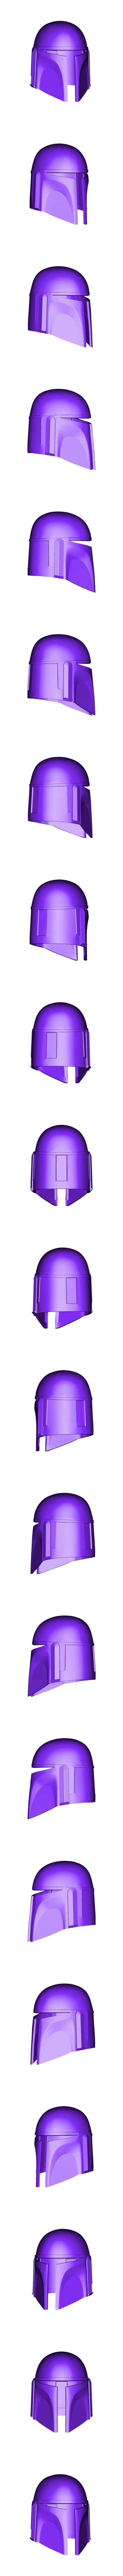 Death_Watch_Mandalorian_Helmet.stl Download free STL file Death Watch Mandalorian Helmet Star Wars • 3D print design, VillainousPropShop